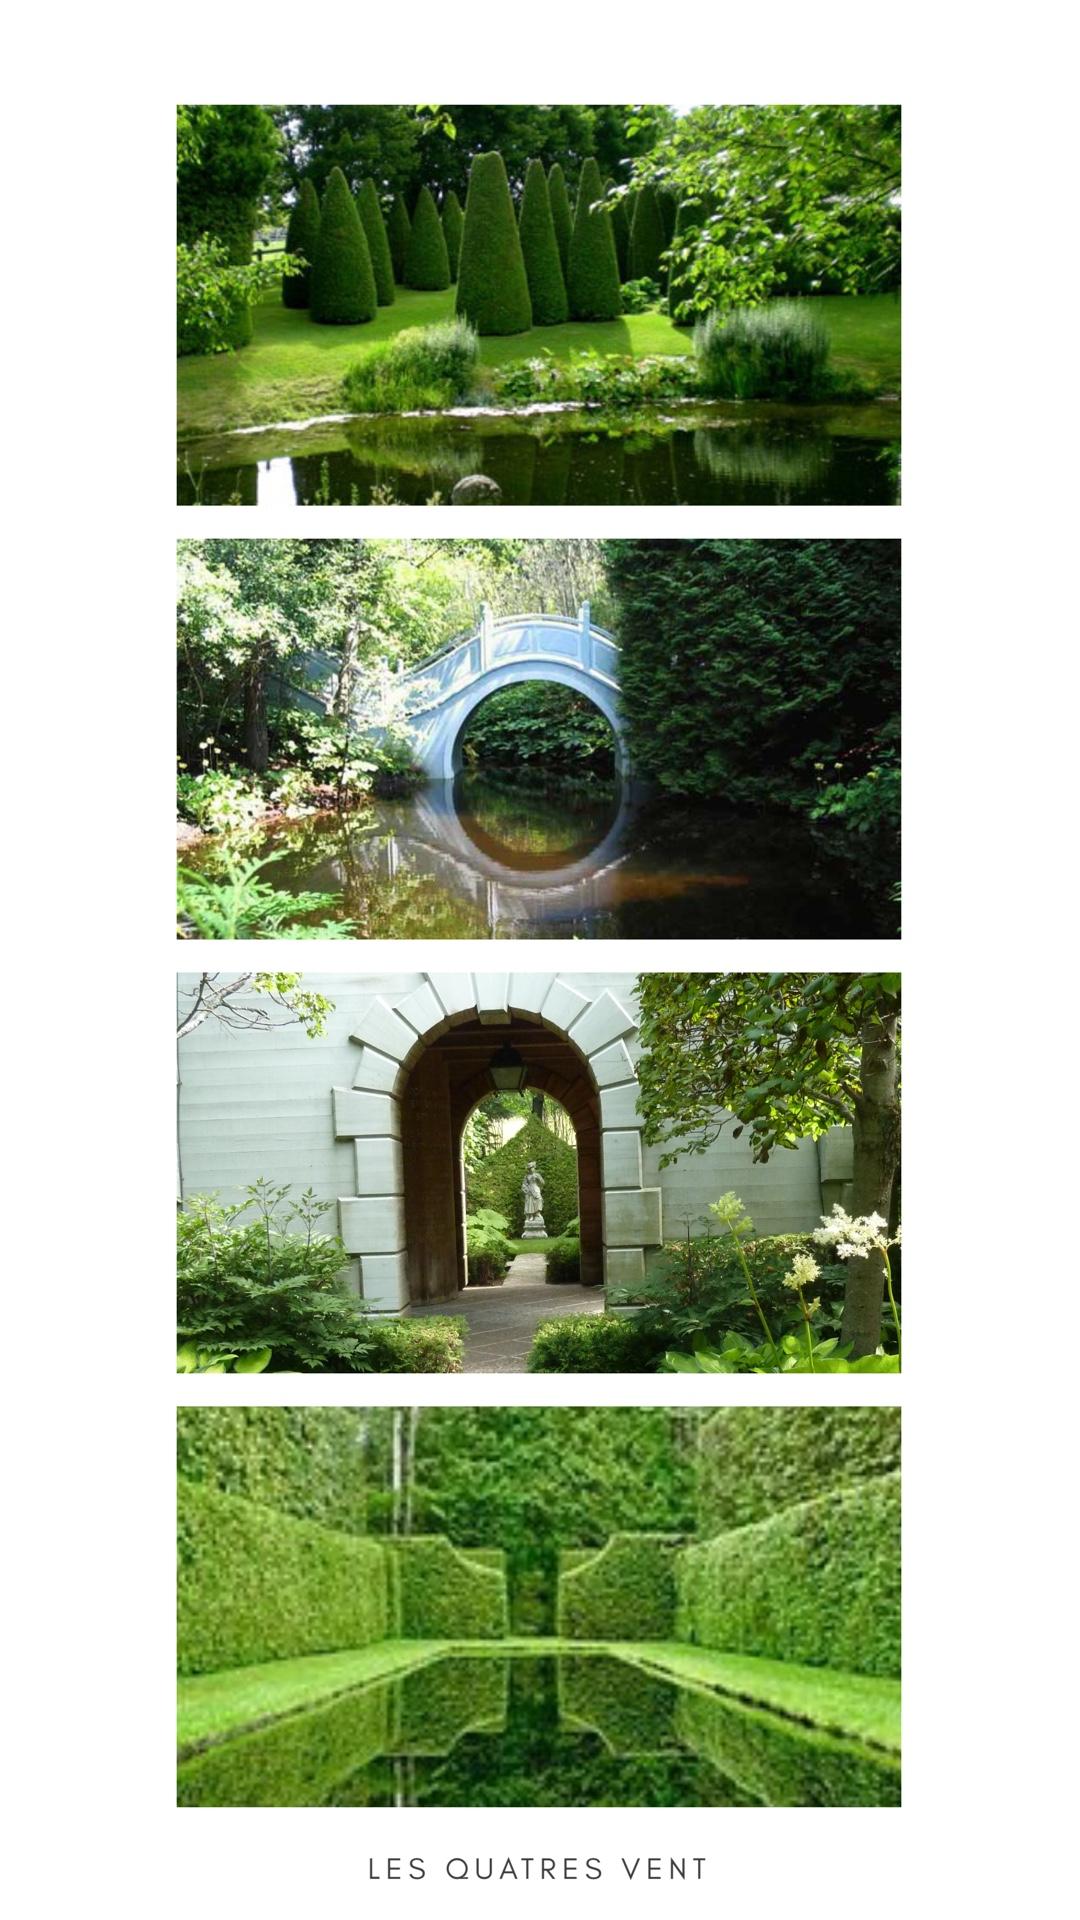 Collage images via Google.